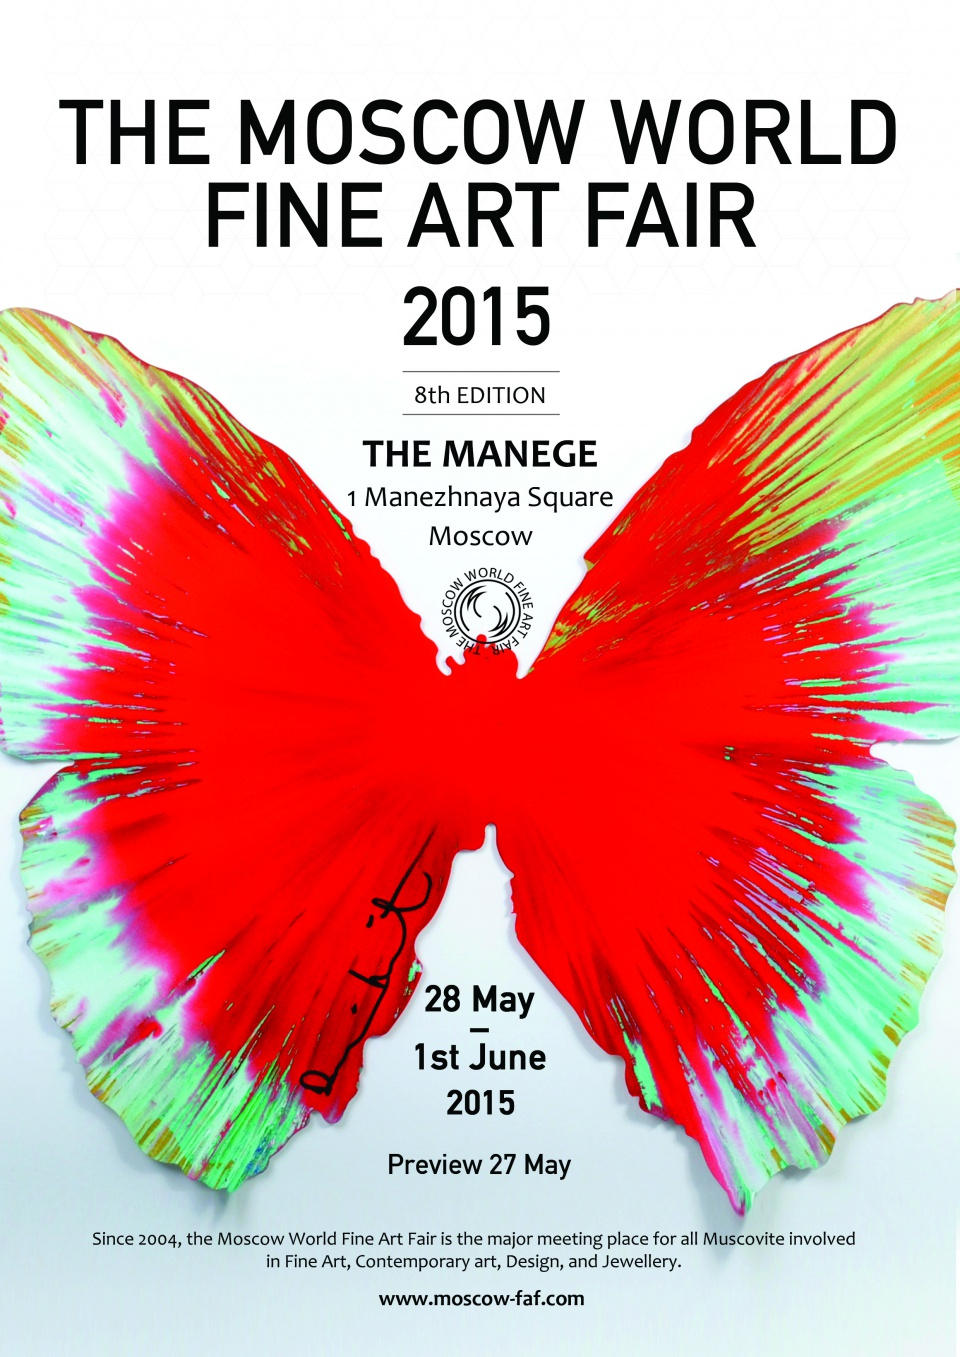 Affiche 2 The Moscow World fine Art Fair 2015